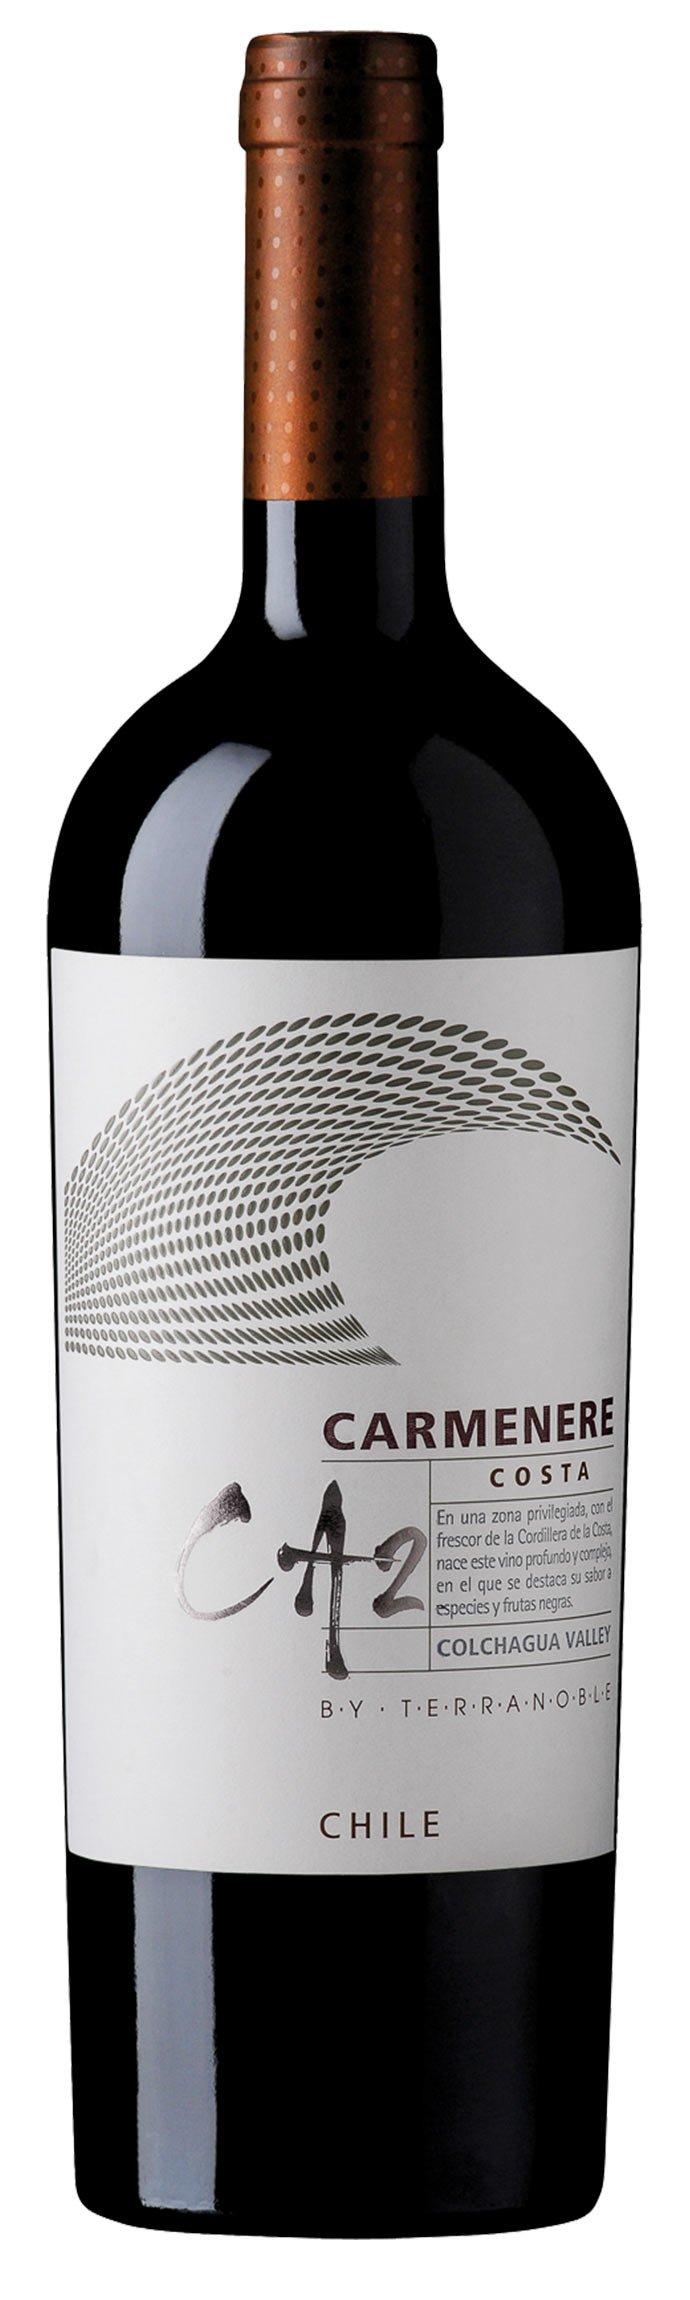 Terra-Noble-Carmenere-Costa-2012-1-x-075-l